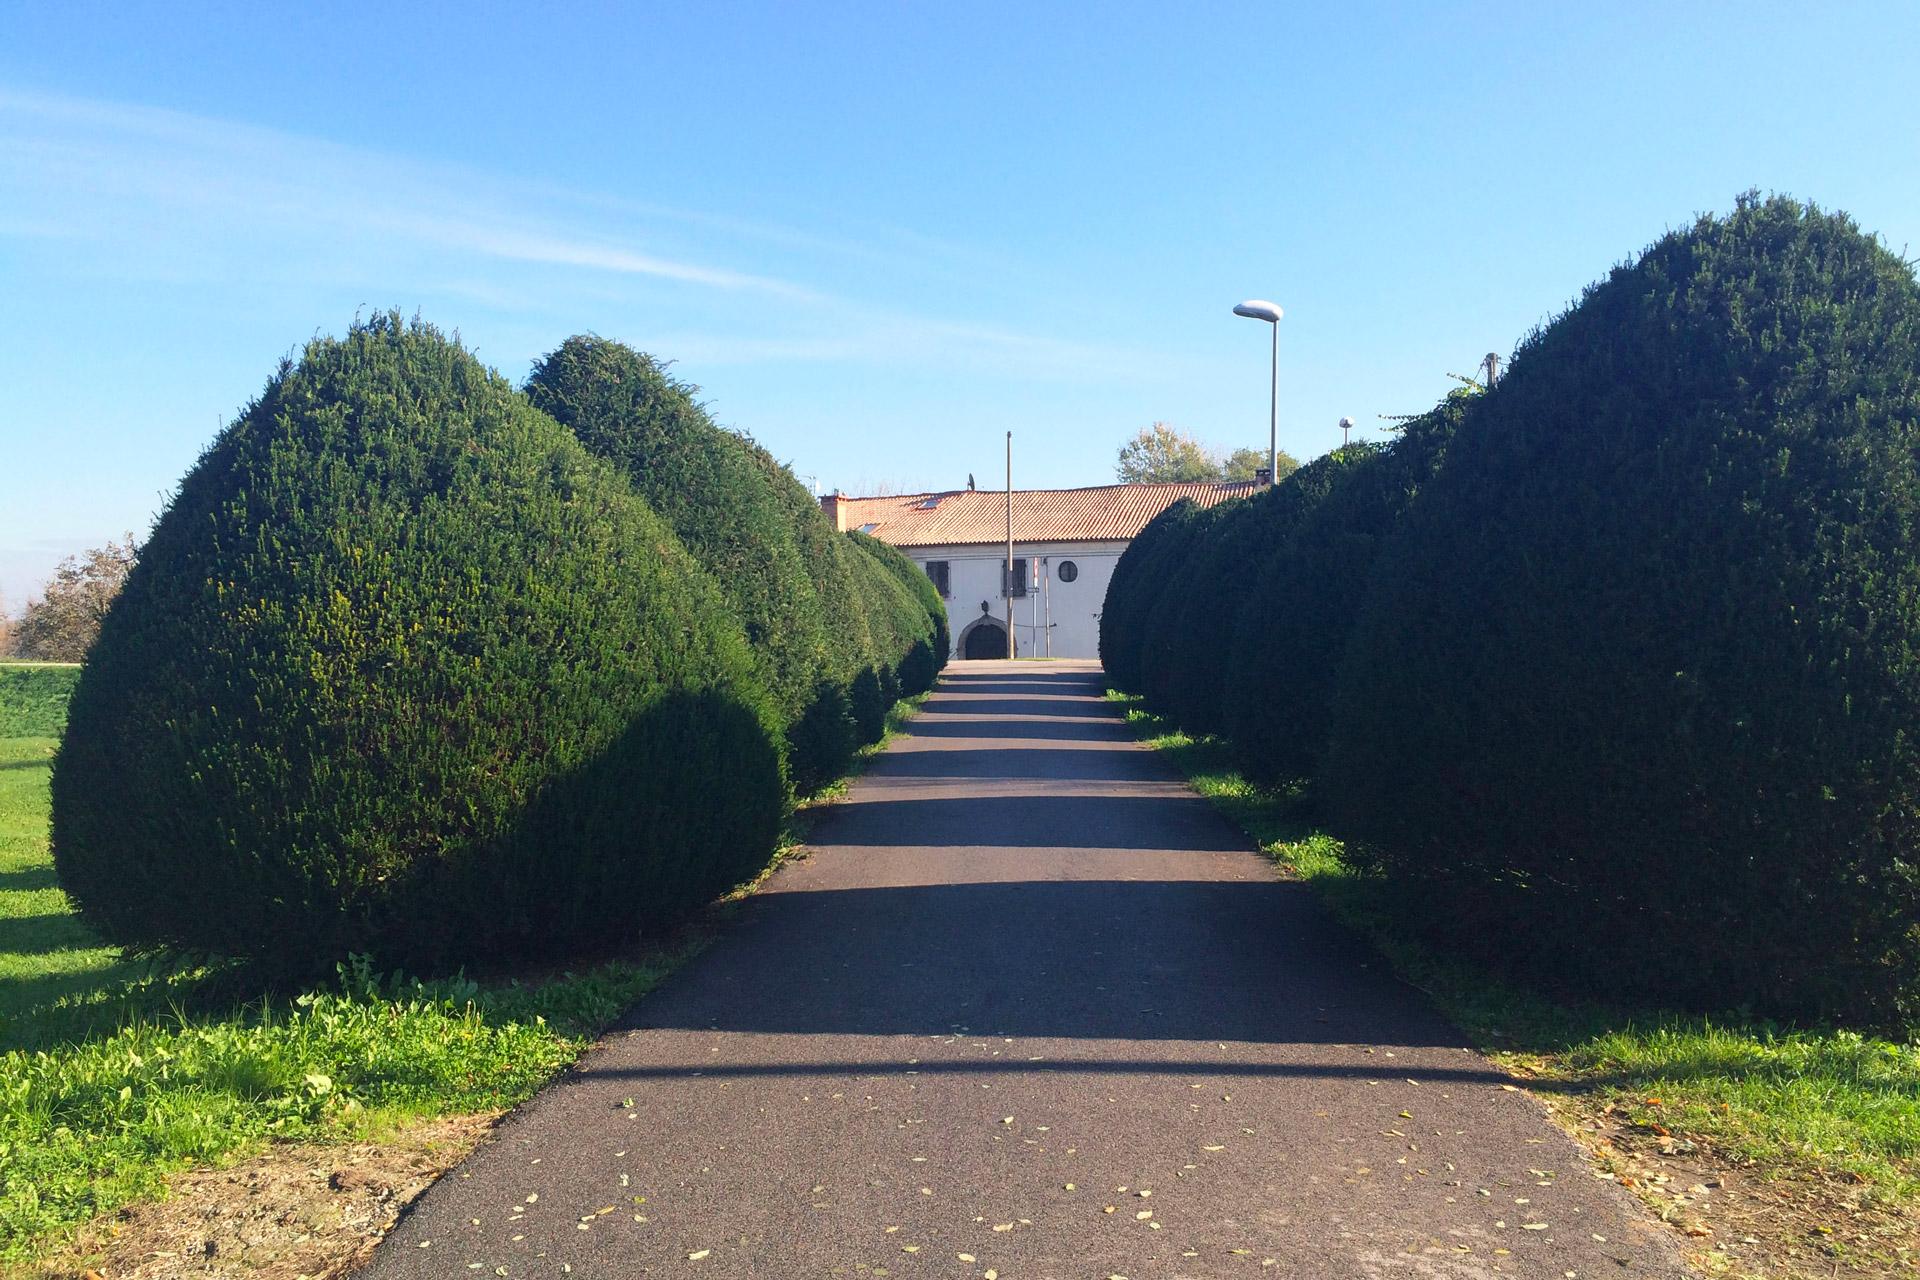 Pernumia_Viale nei pressi di Via Palù Inferiore